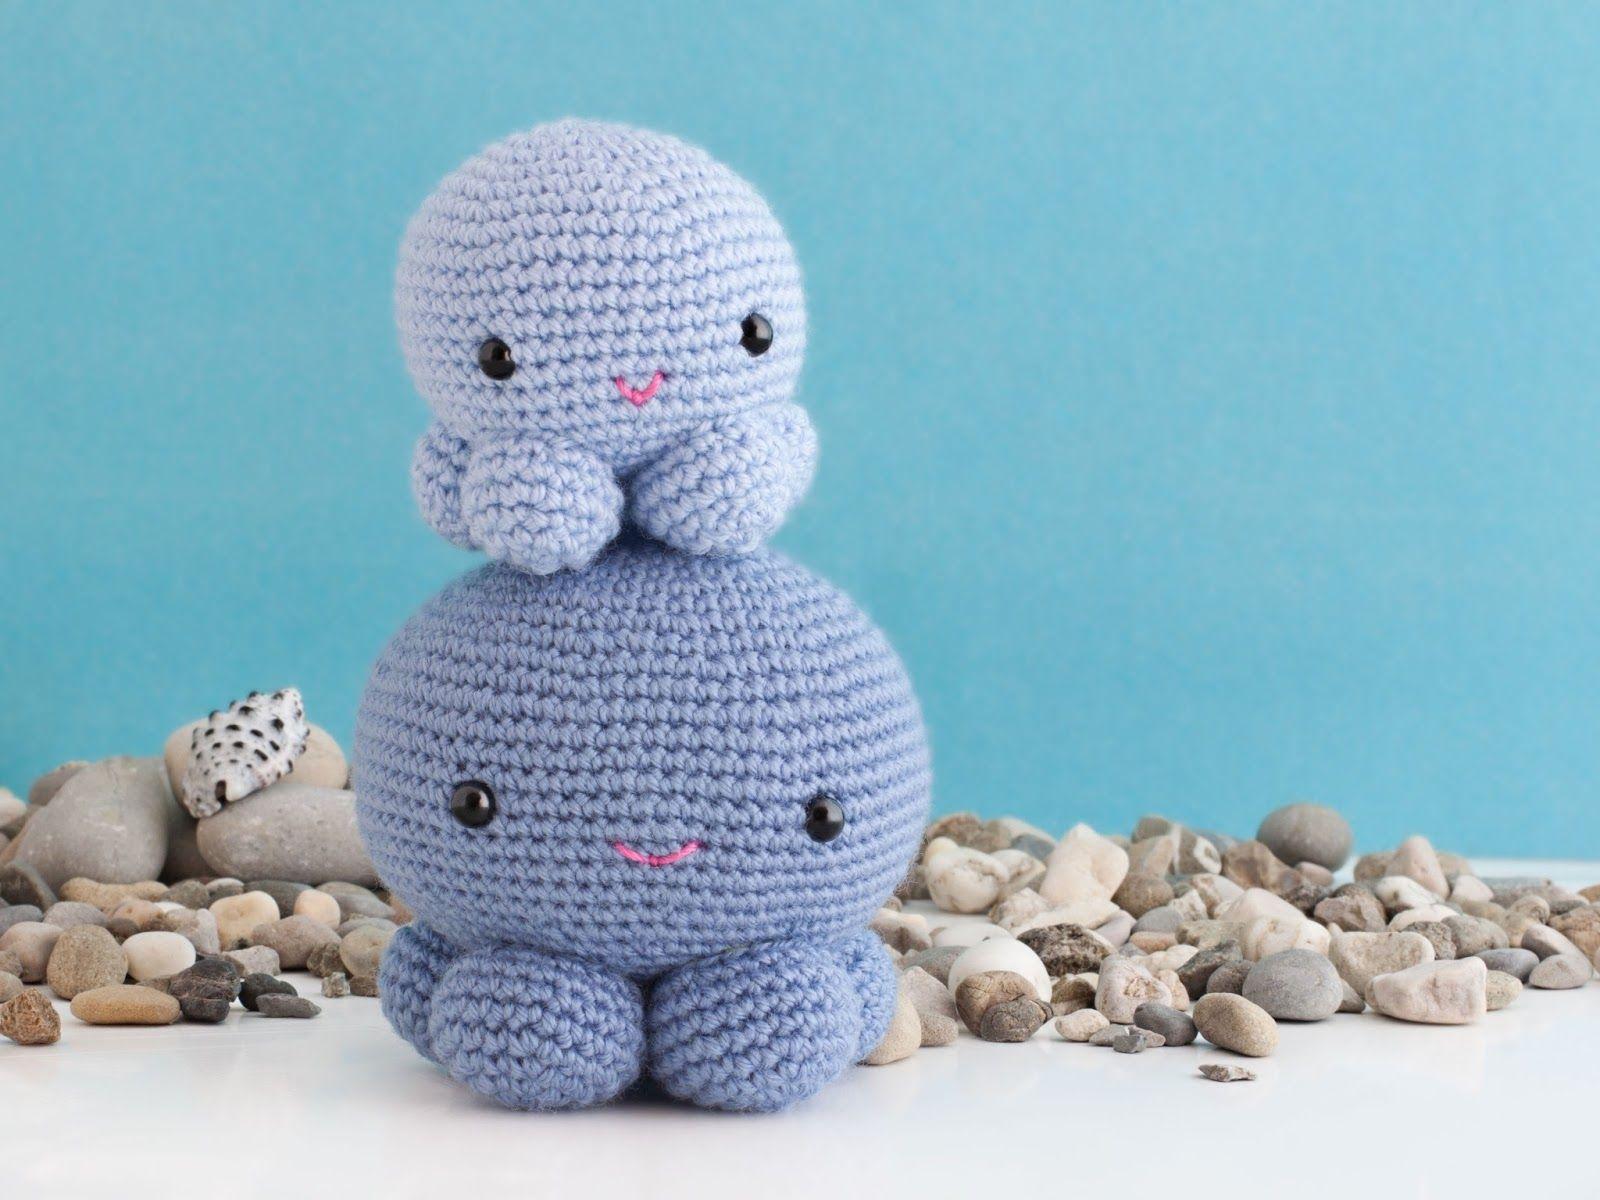 Tutorial Amigurumi : Amigurumi octopus free crochet pattern tutorial amigurumi